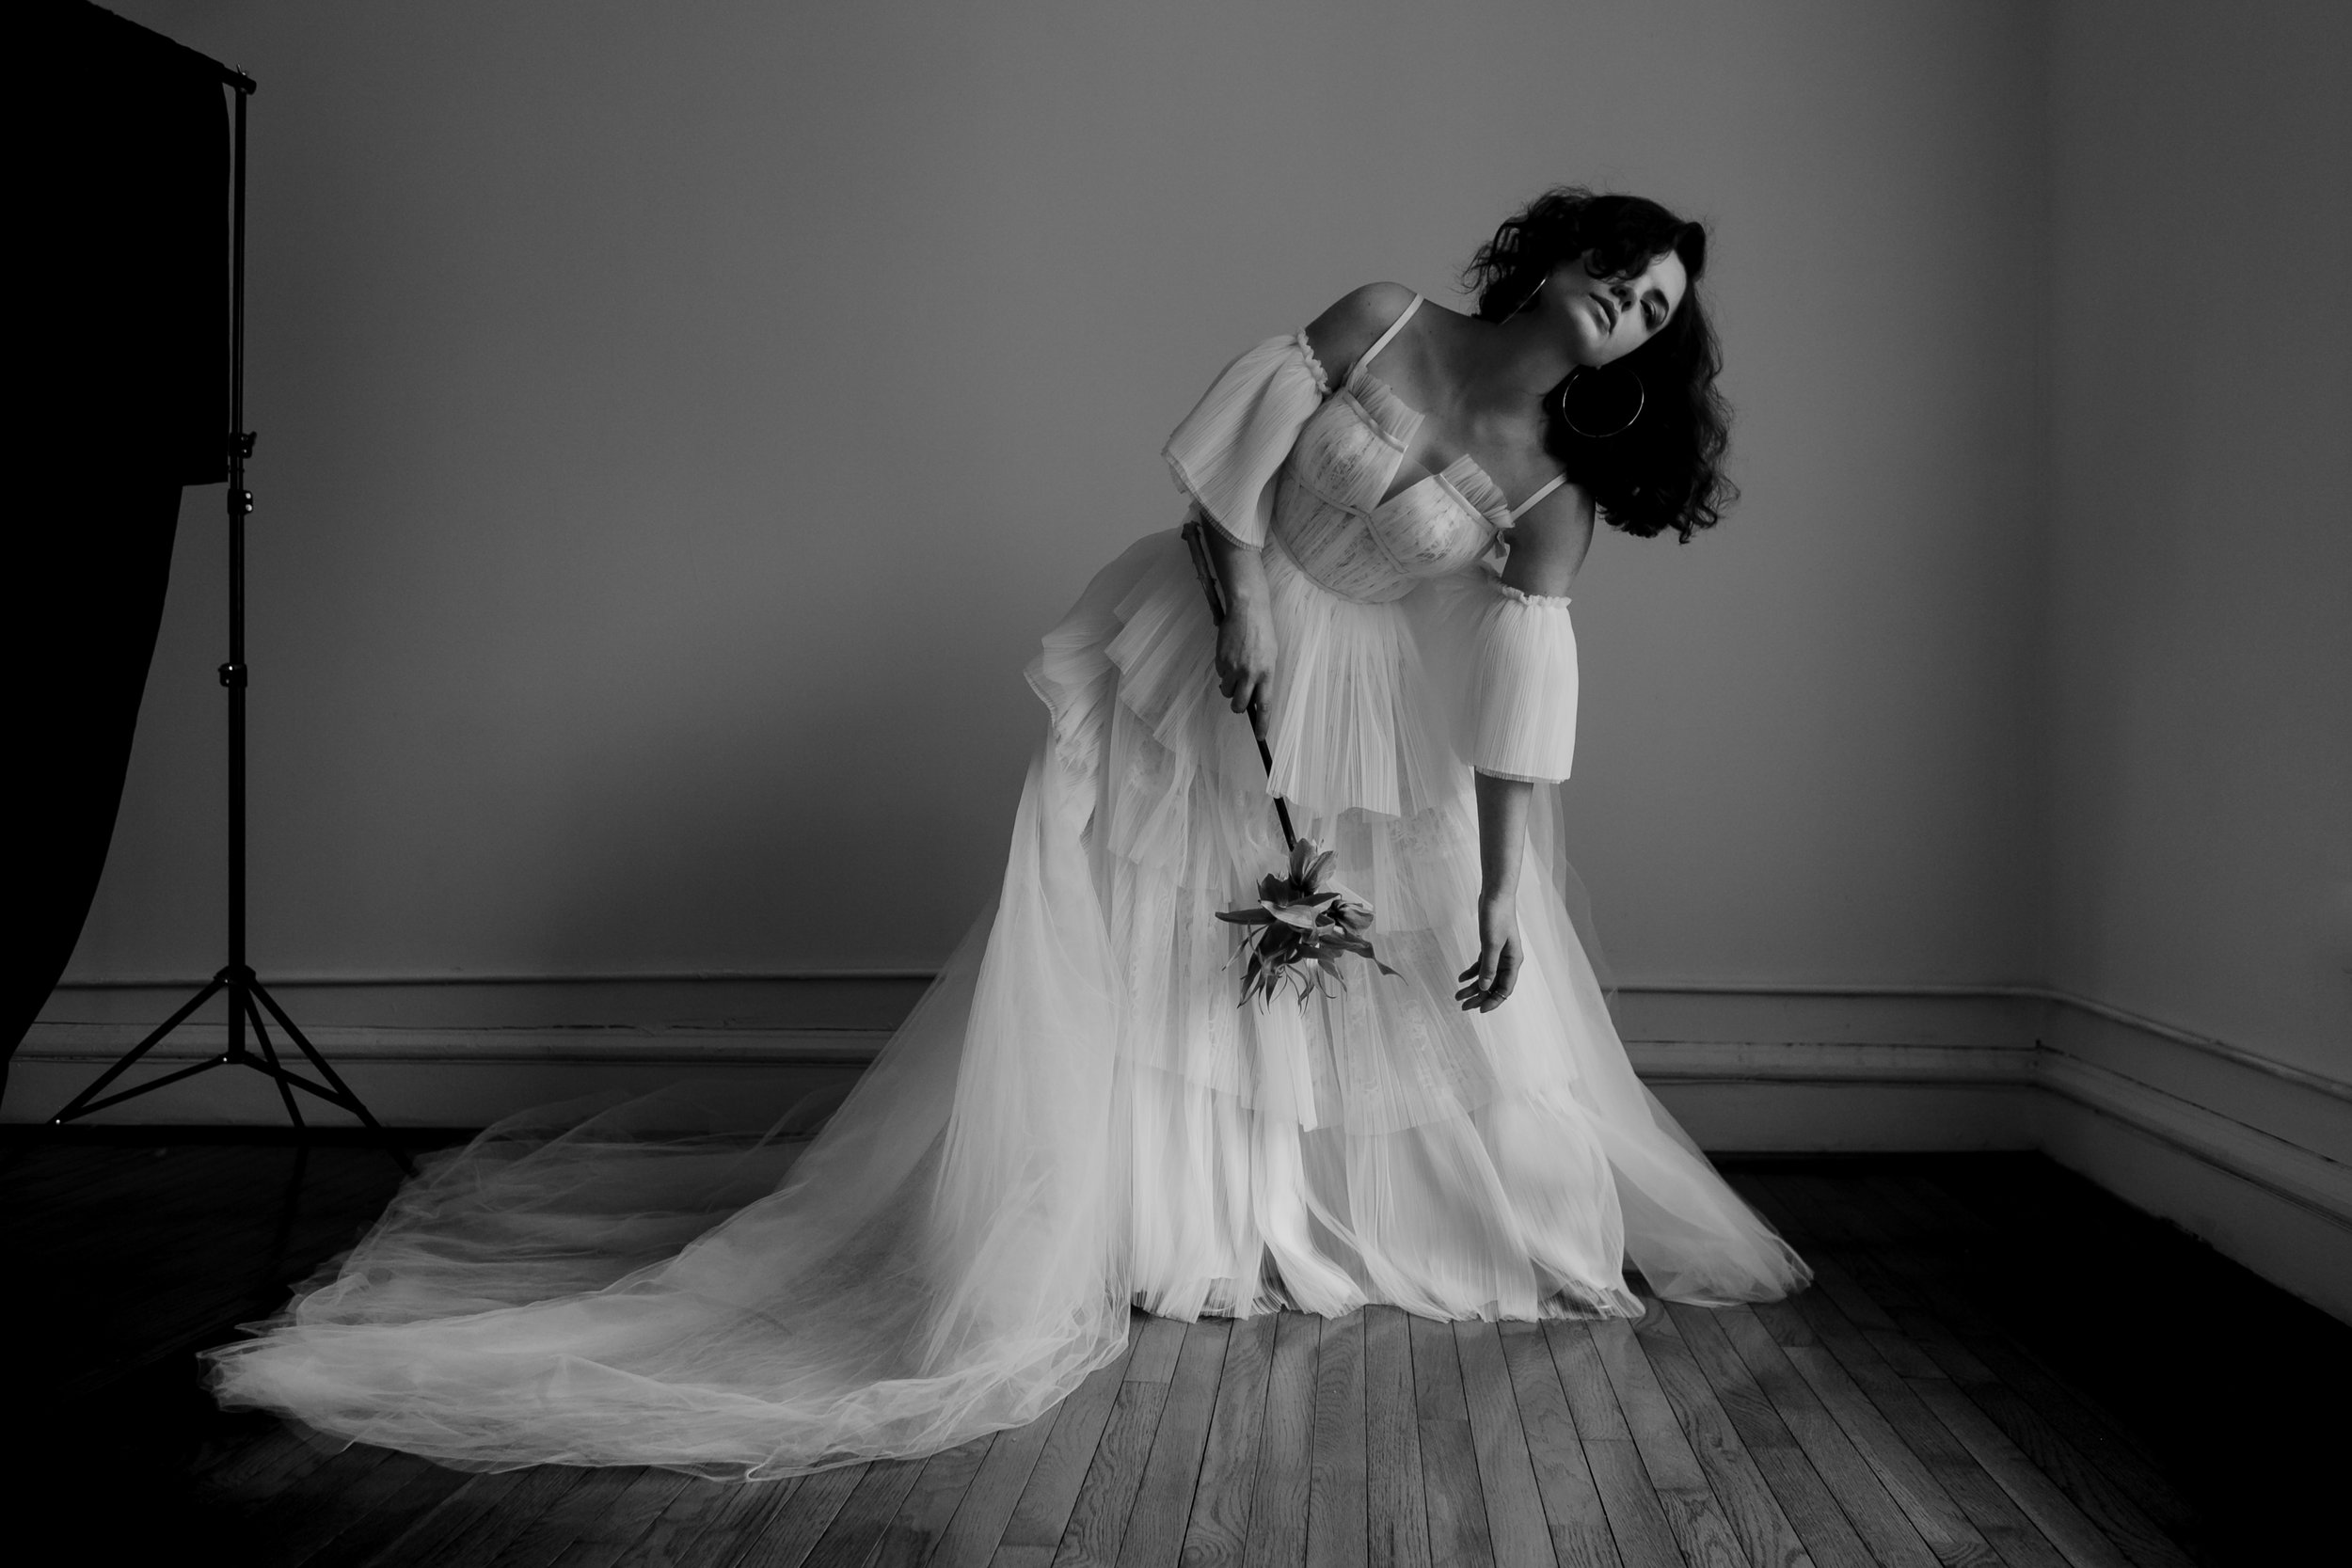 Chicago-Bride-Wedding-Dress-Varca-Edited-619.jpg